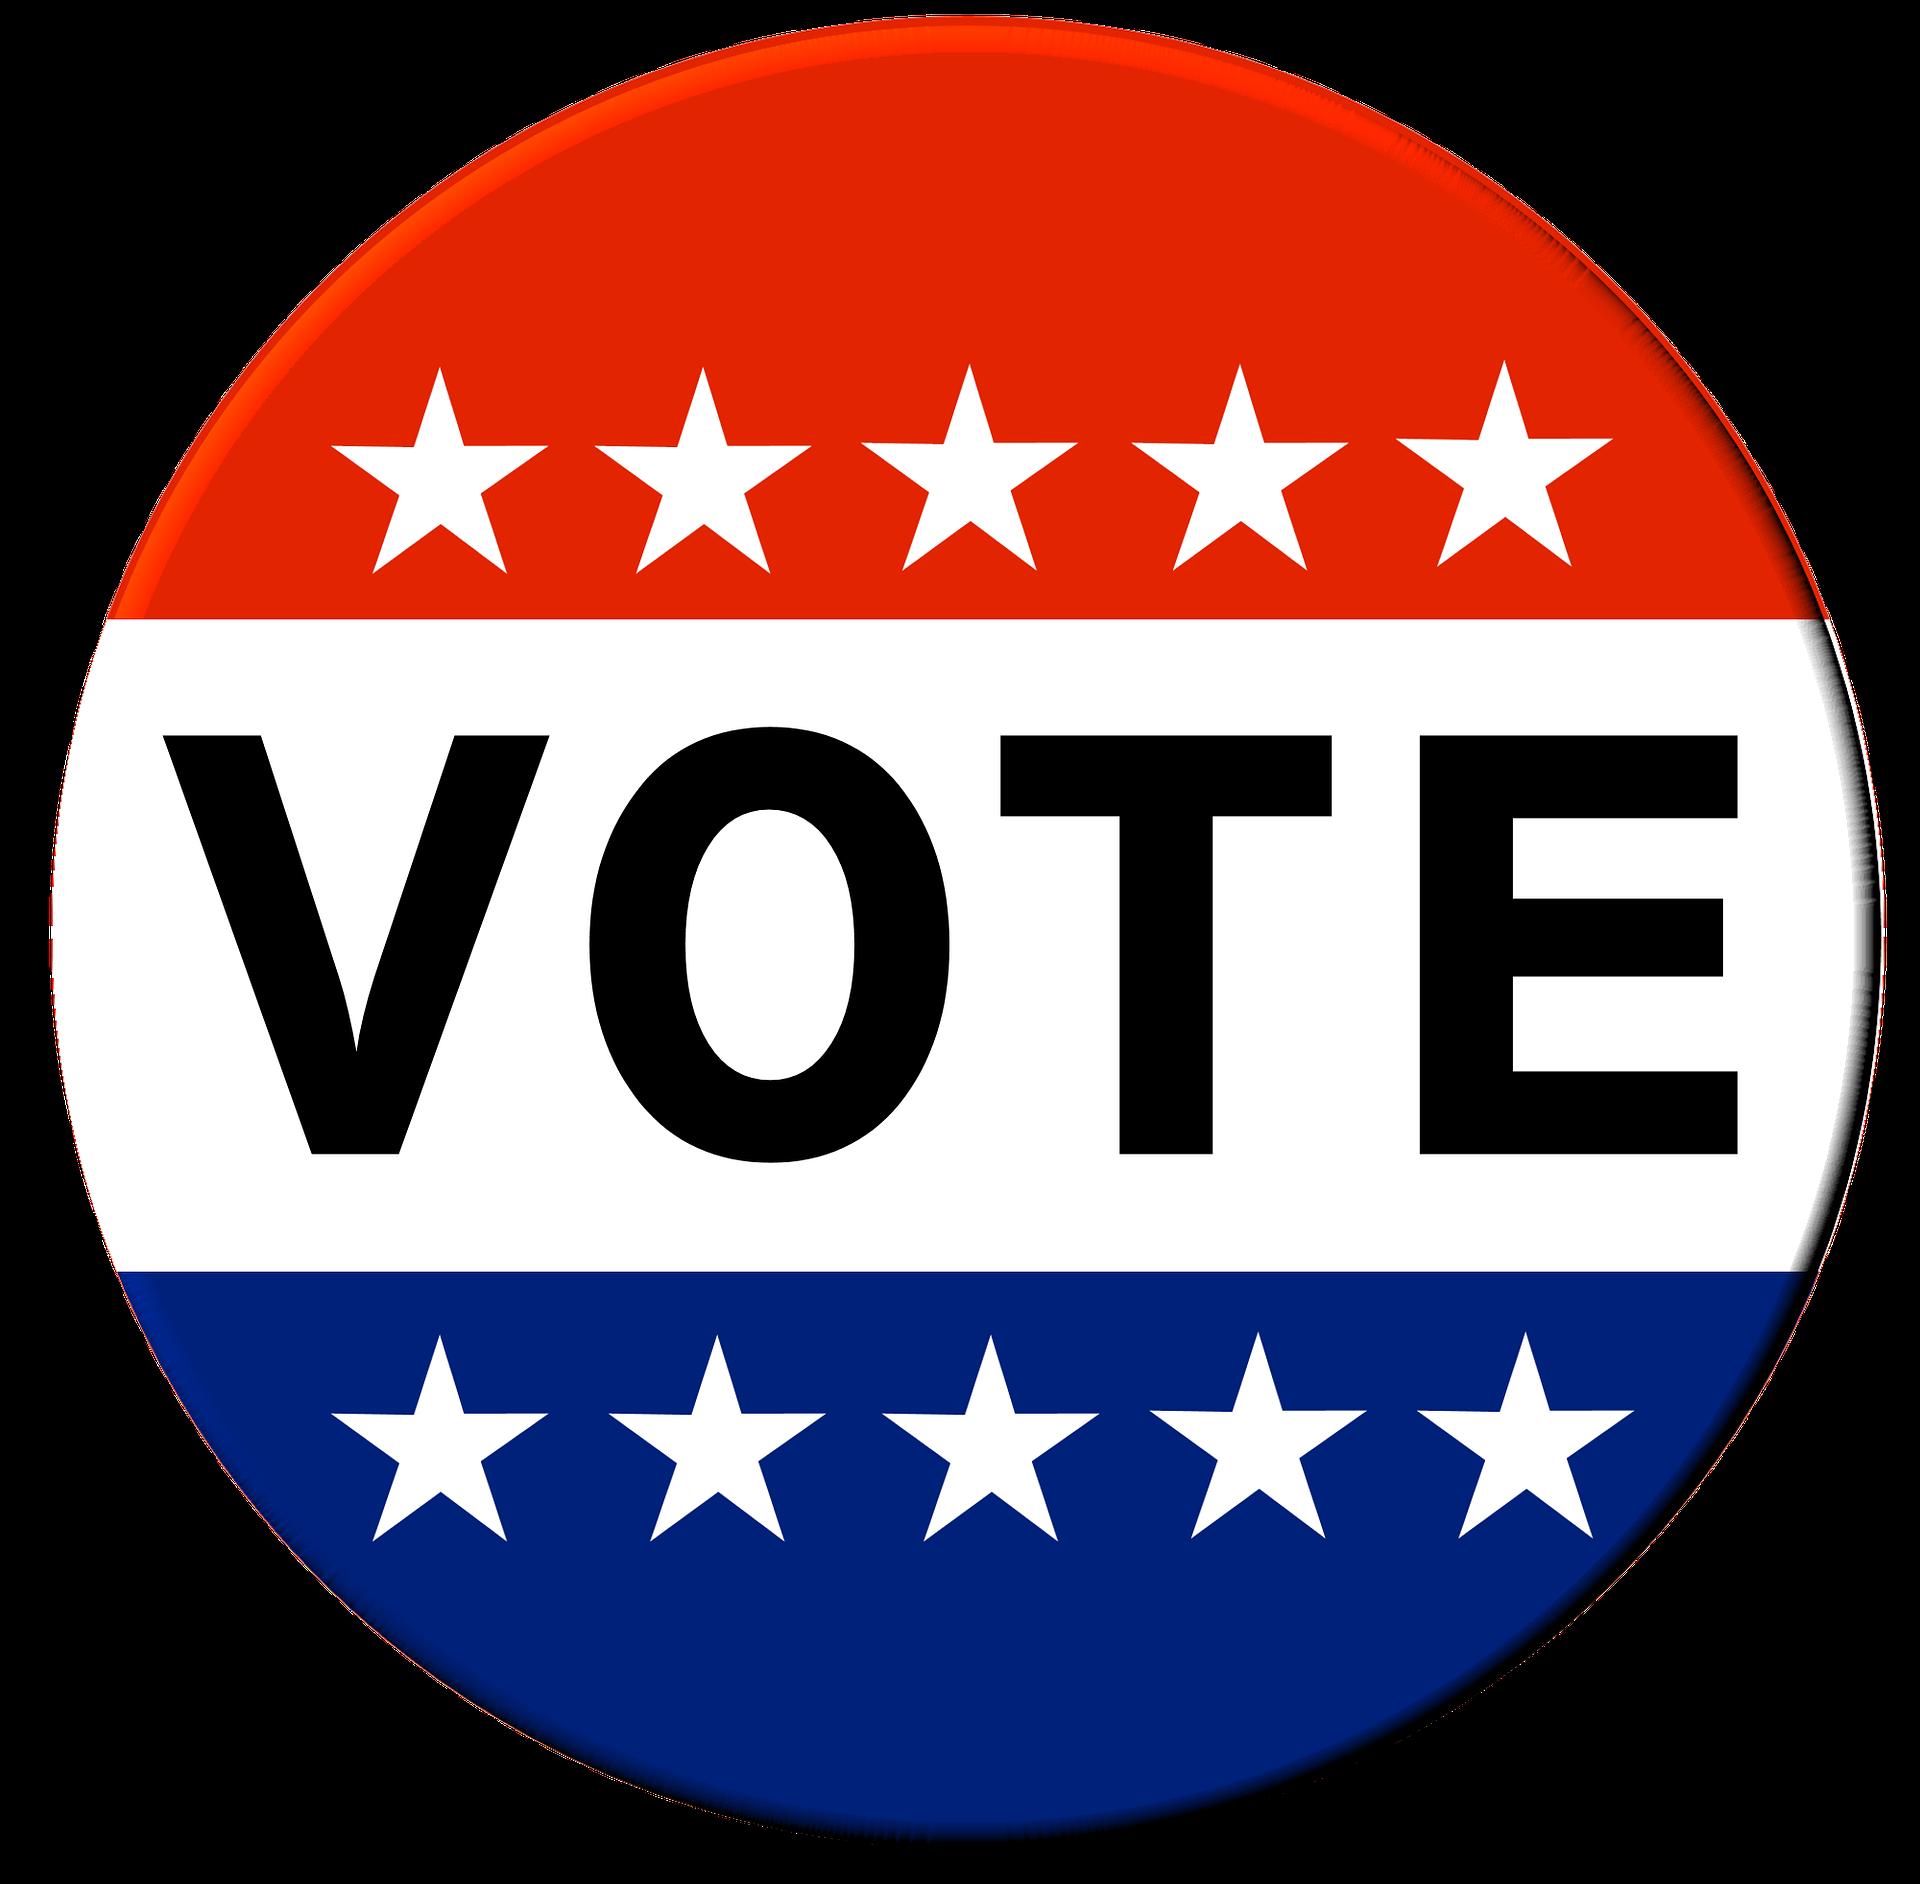 ElectionNight - Tuesday, May 15 at 5:45